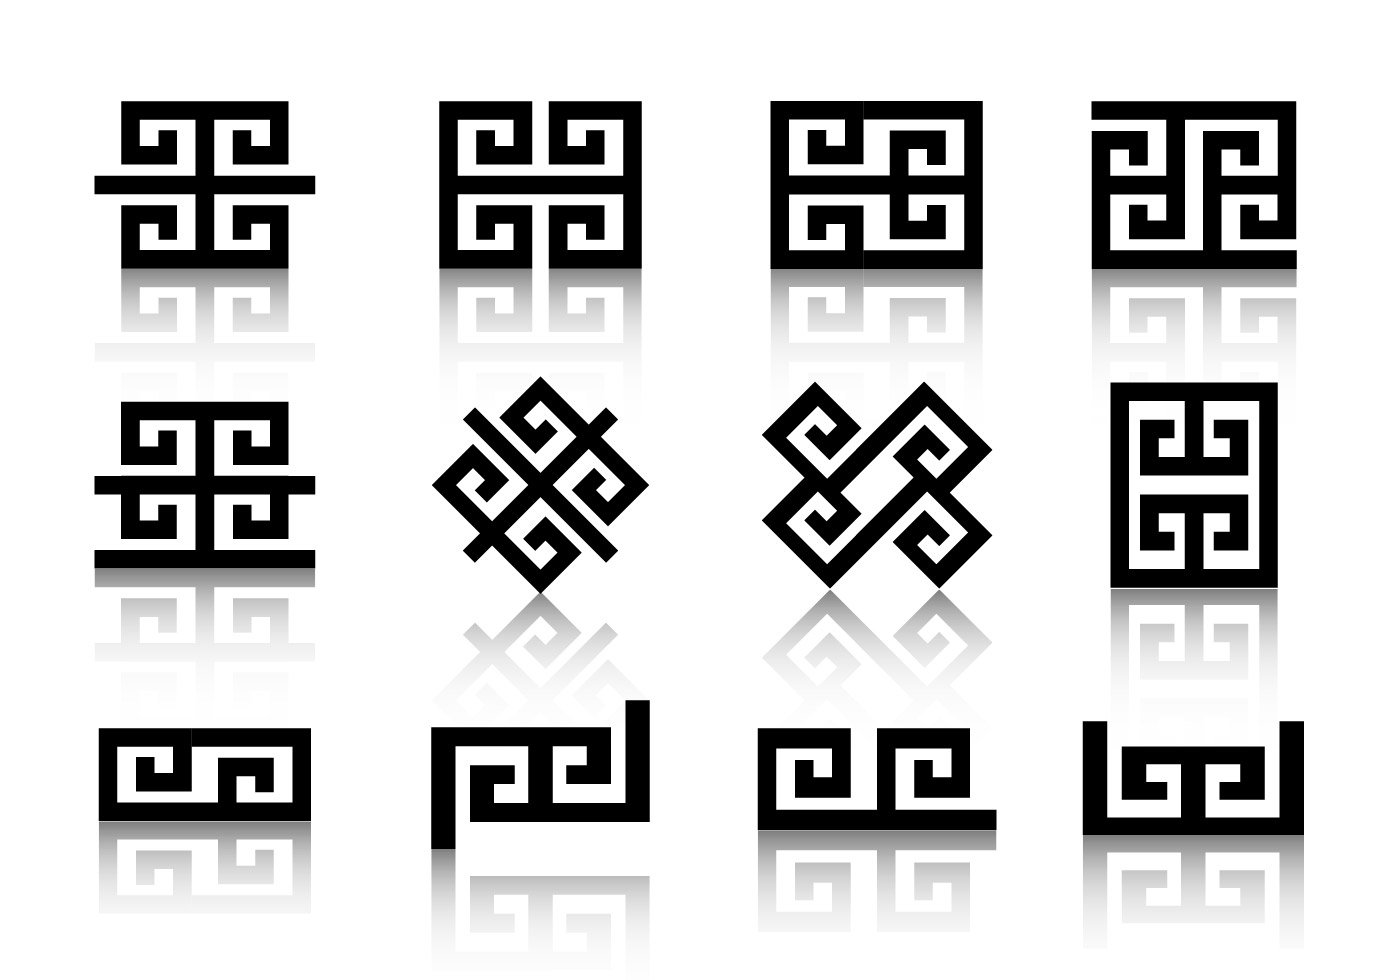 versace icon download free vector art stock graphics